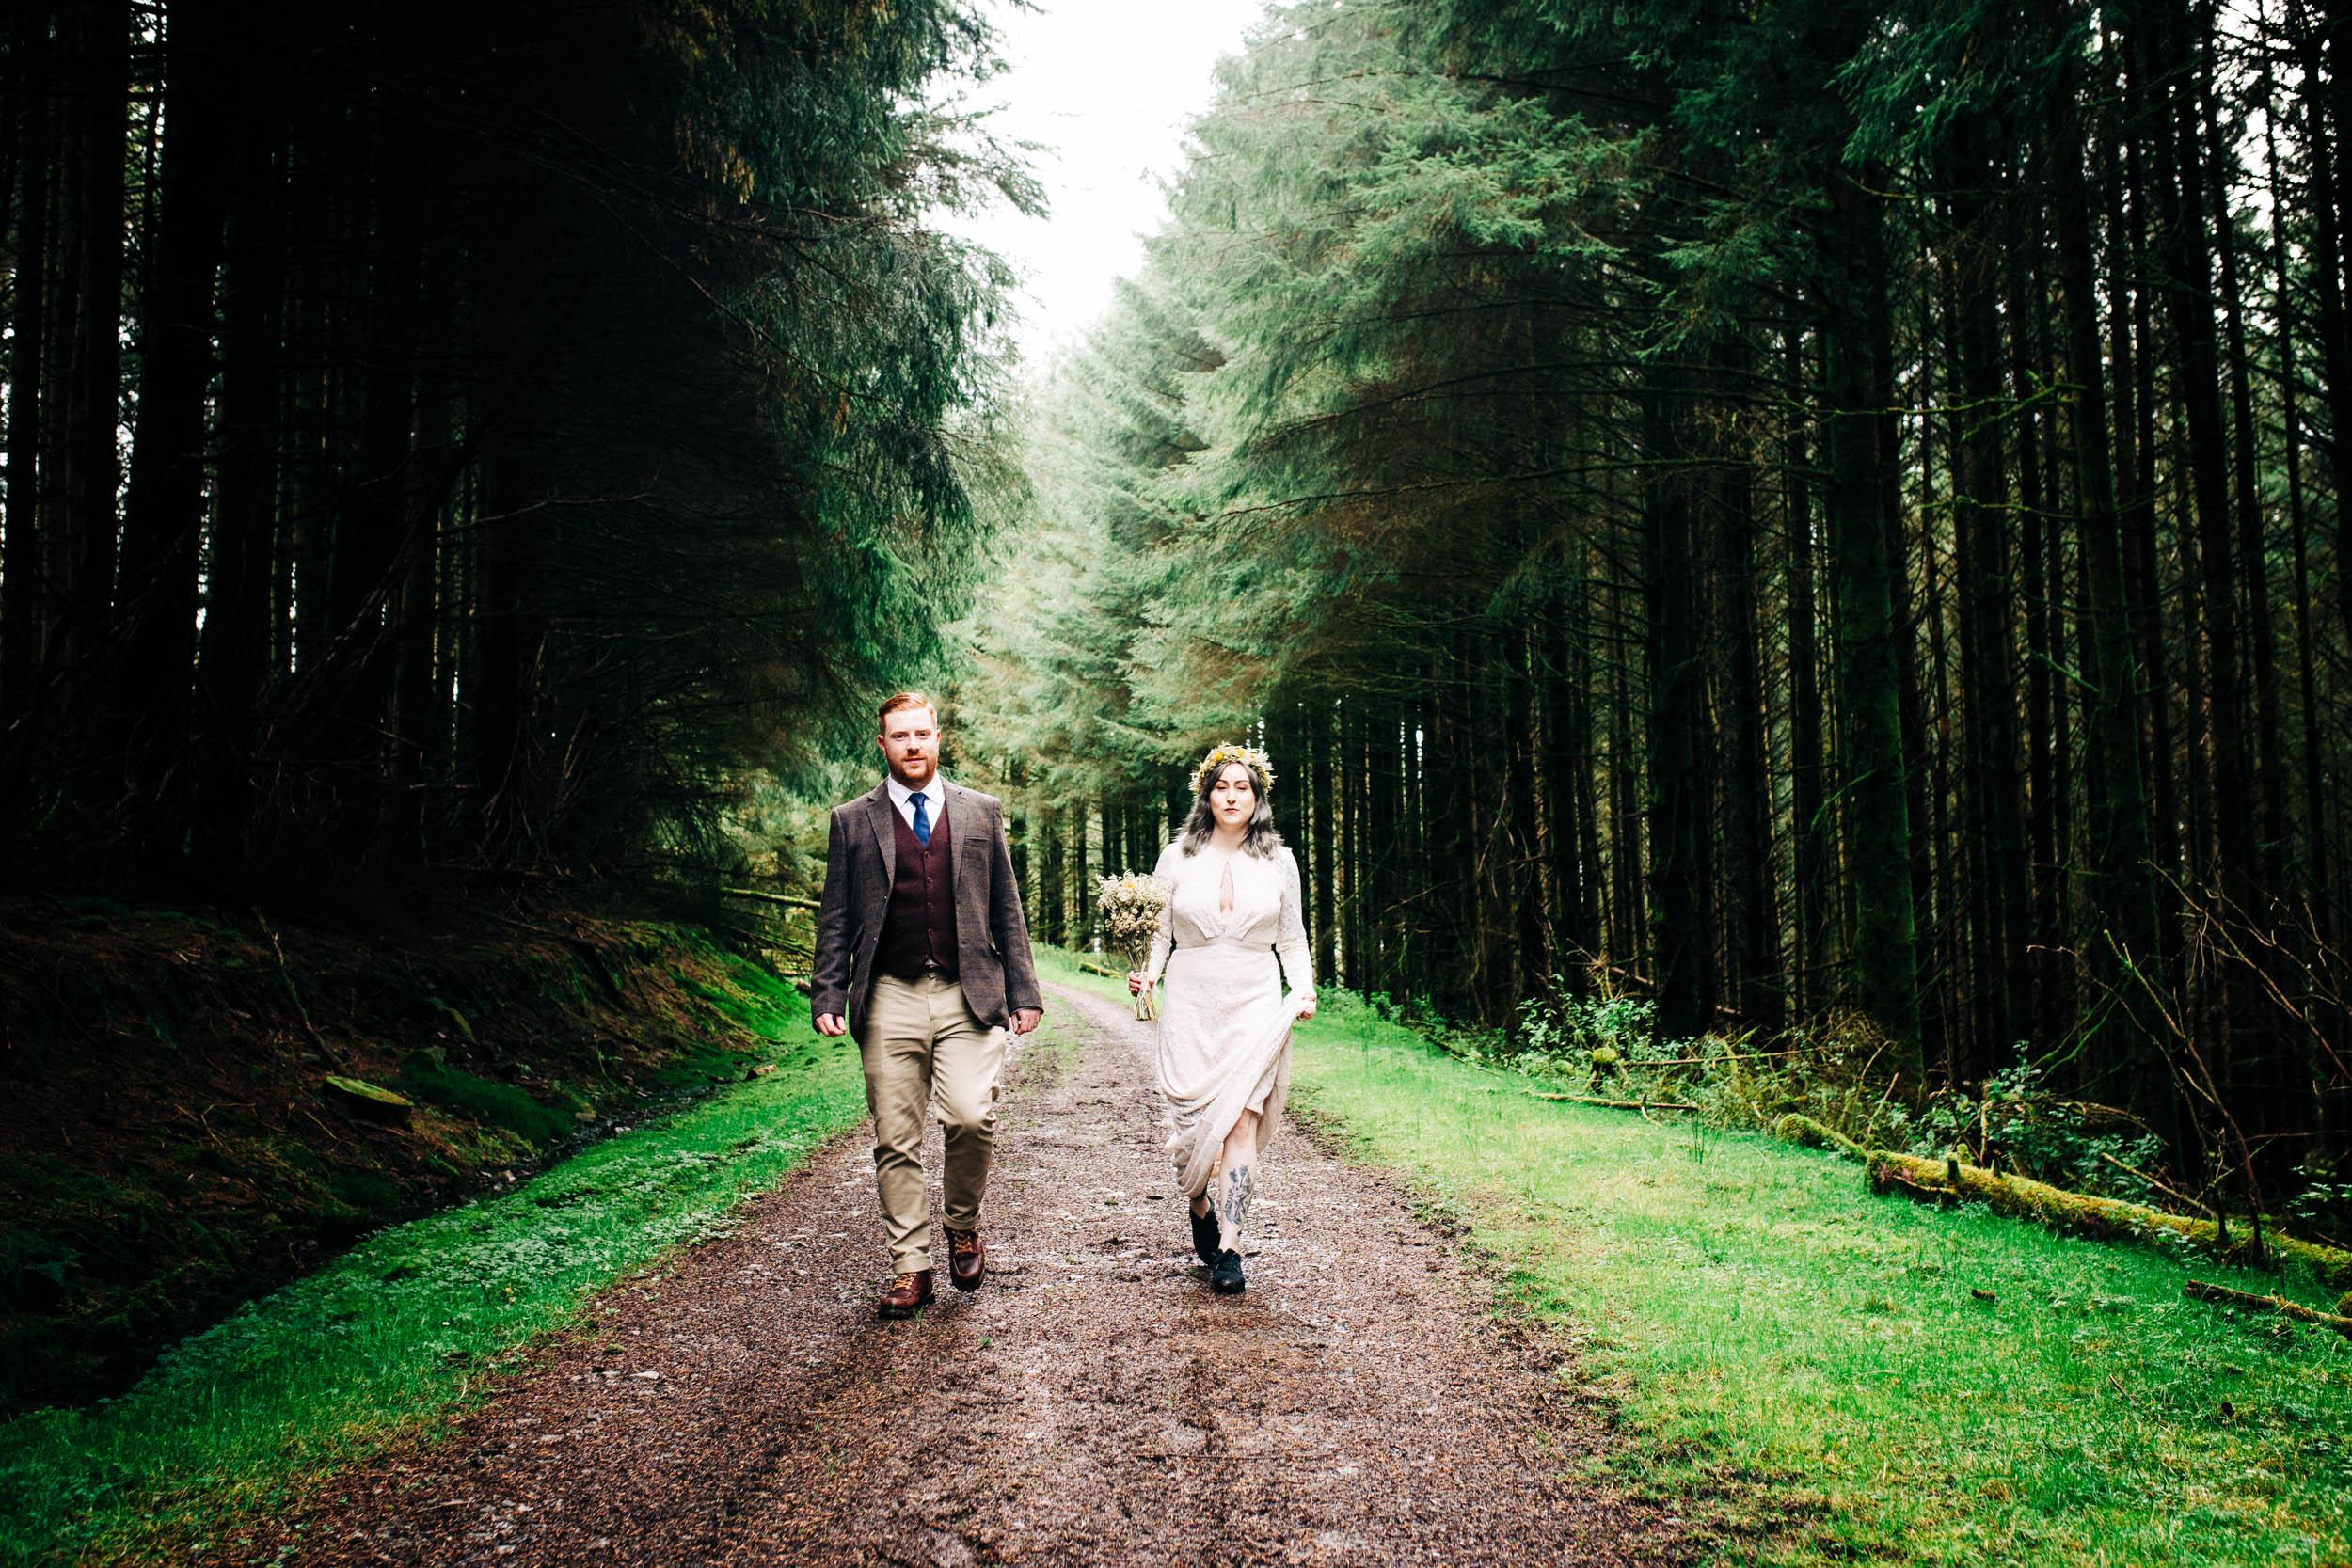 Alex_Sedgmond_Photography-SouthWalesWeddingPhotography-Wedding-Photographer-Cardiff-70.jpg